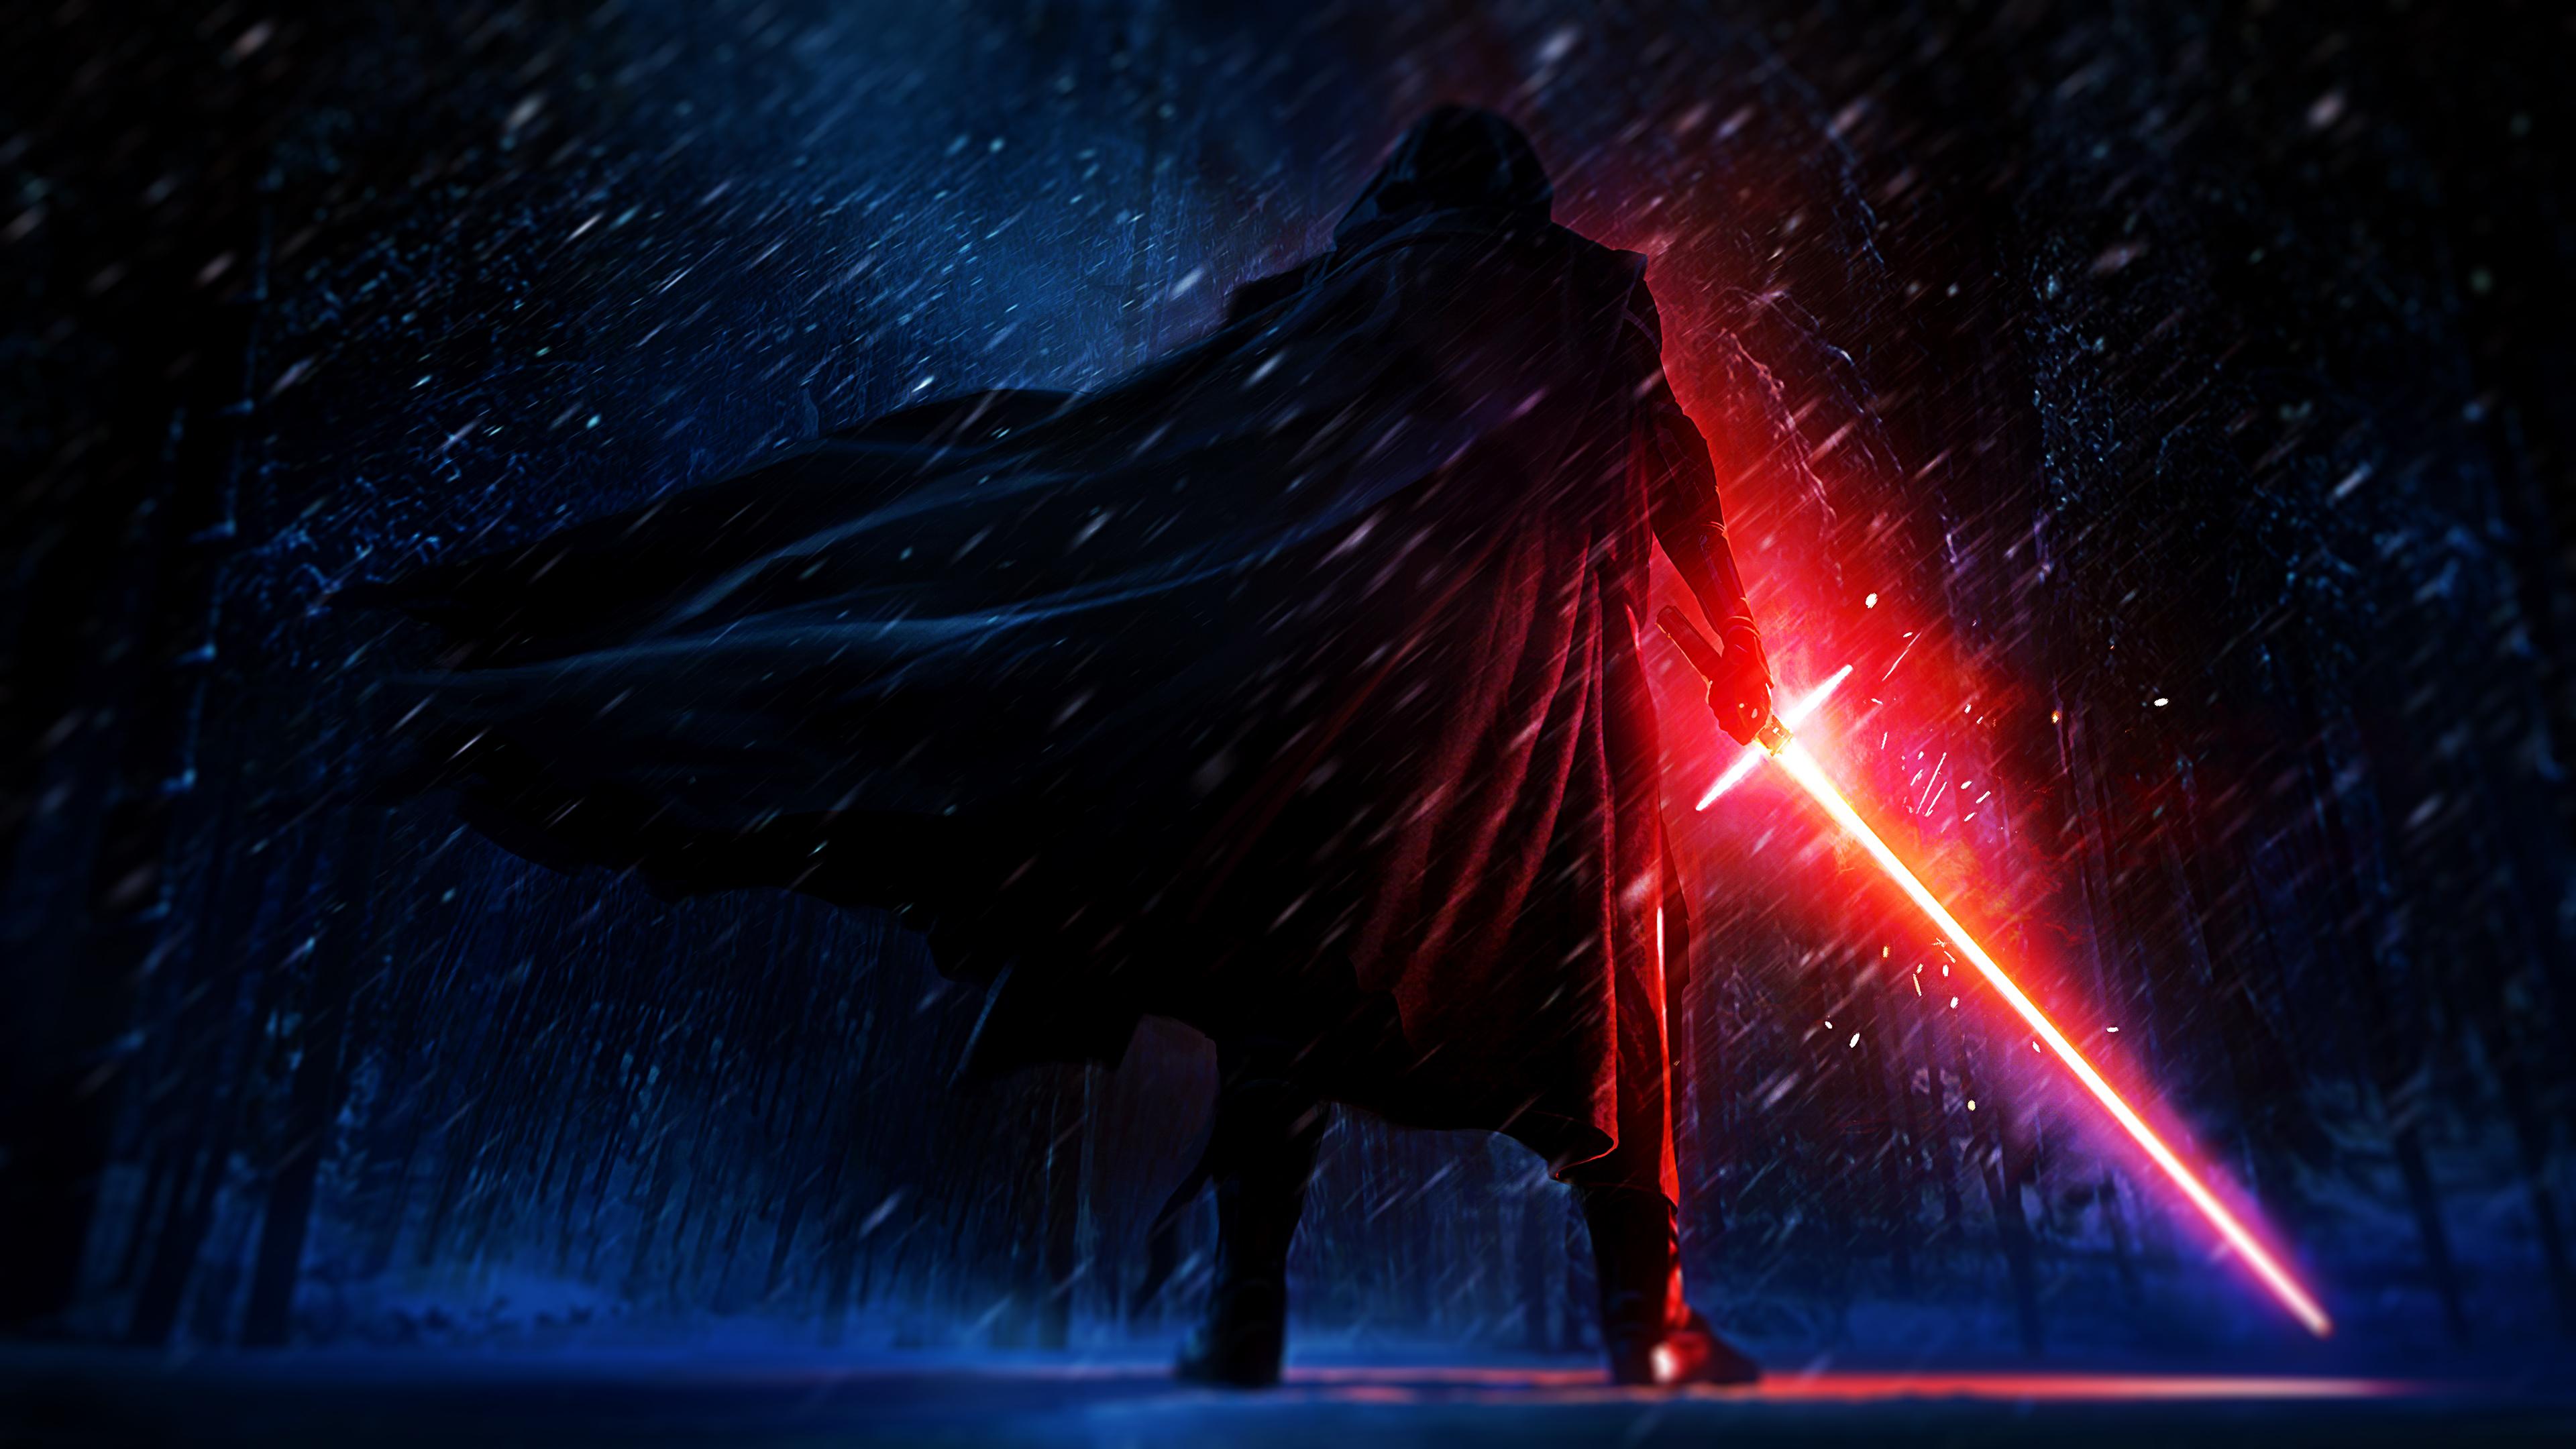 4k Kylo Ren   Star Wars   Artwork [Wallpaper] by NicolasLFBV on 3840x2160